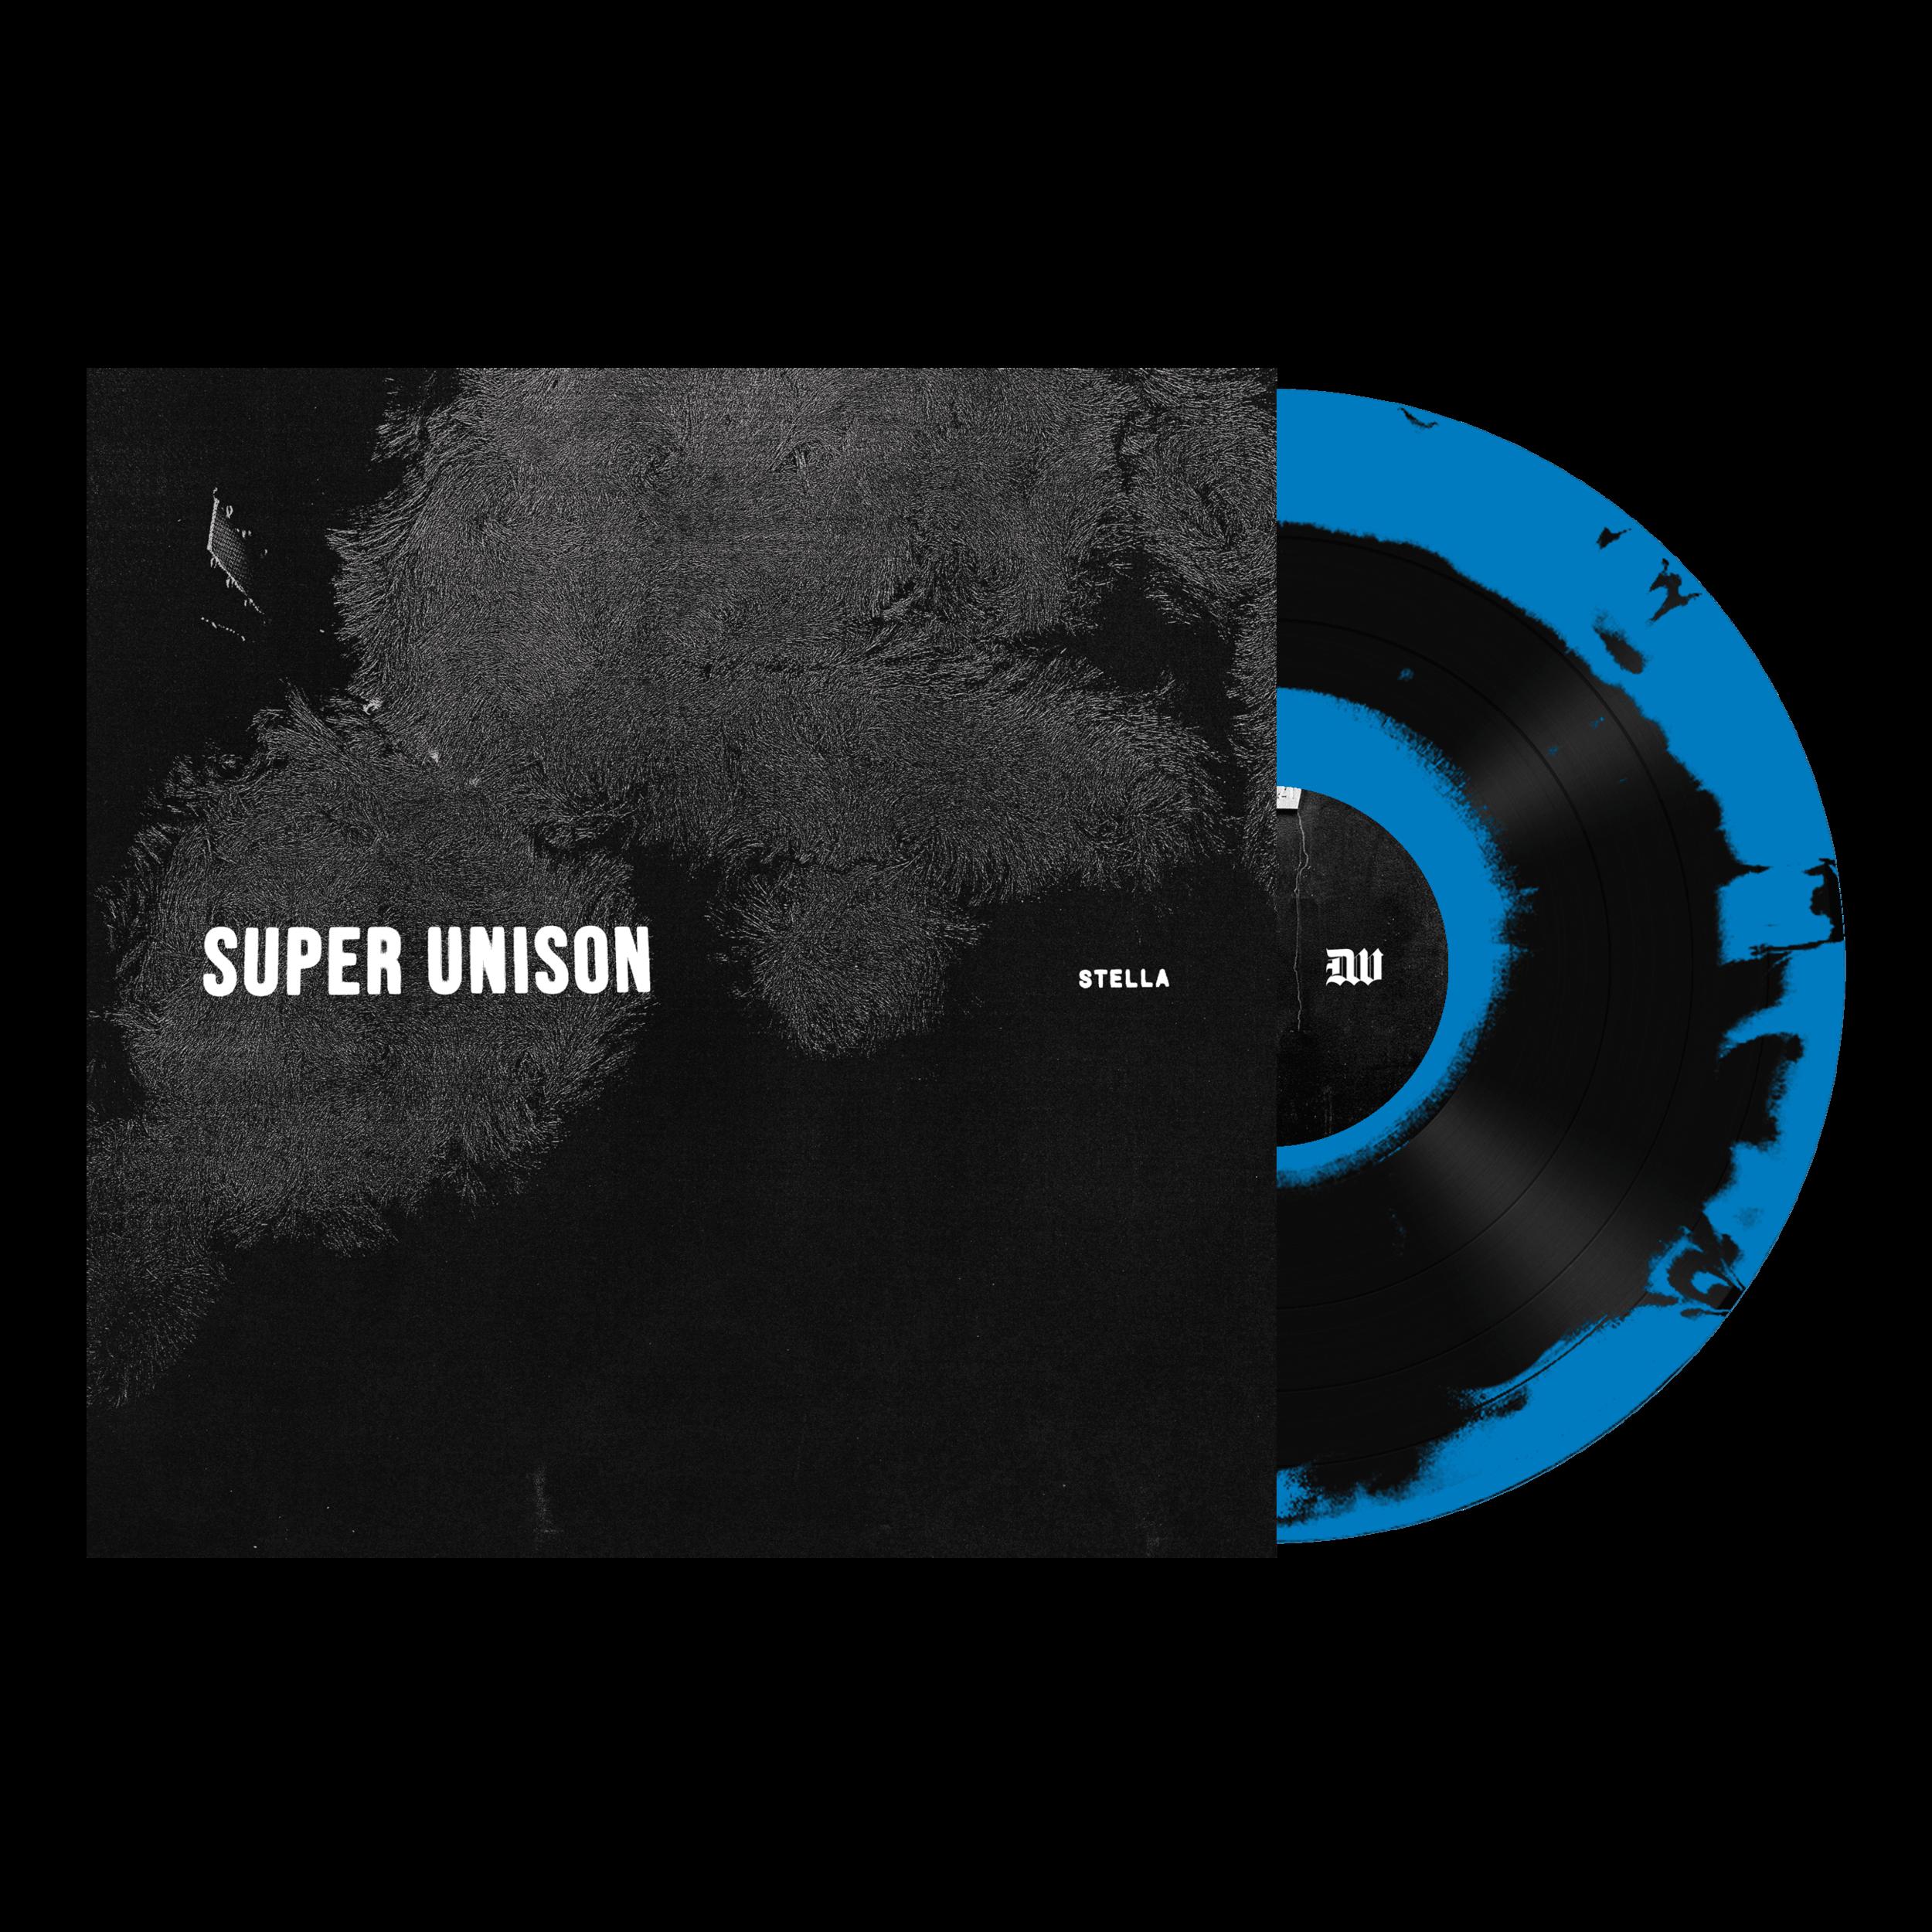 SuperUnison.Stella.BlackProcessBlue(5)mix.DWExclusive.mockup.png